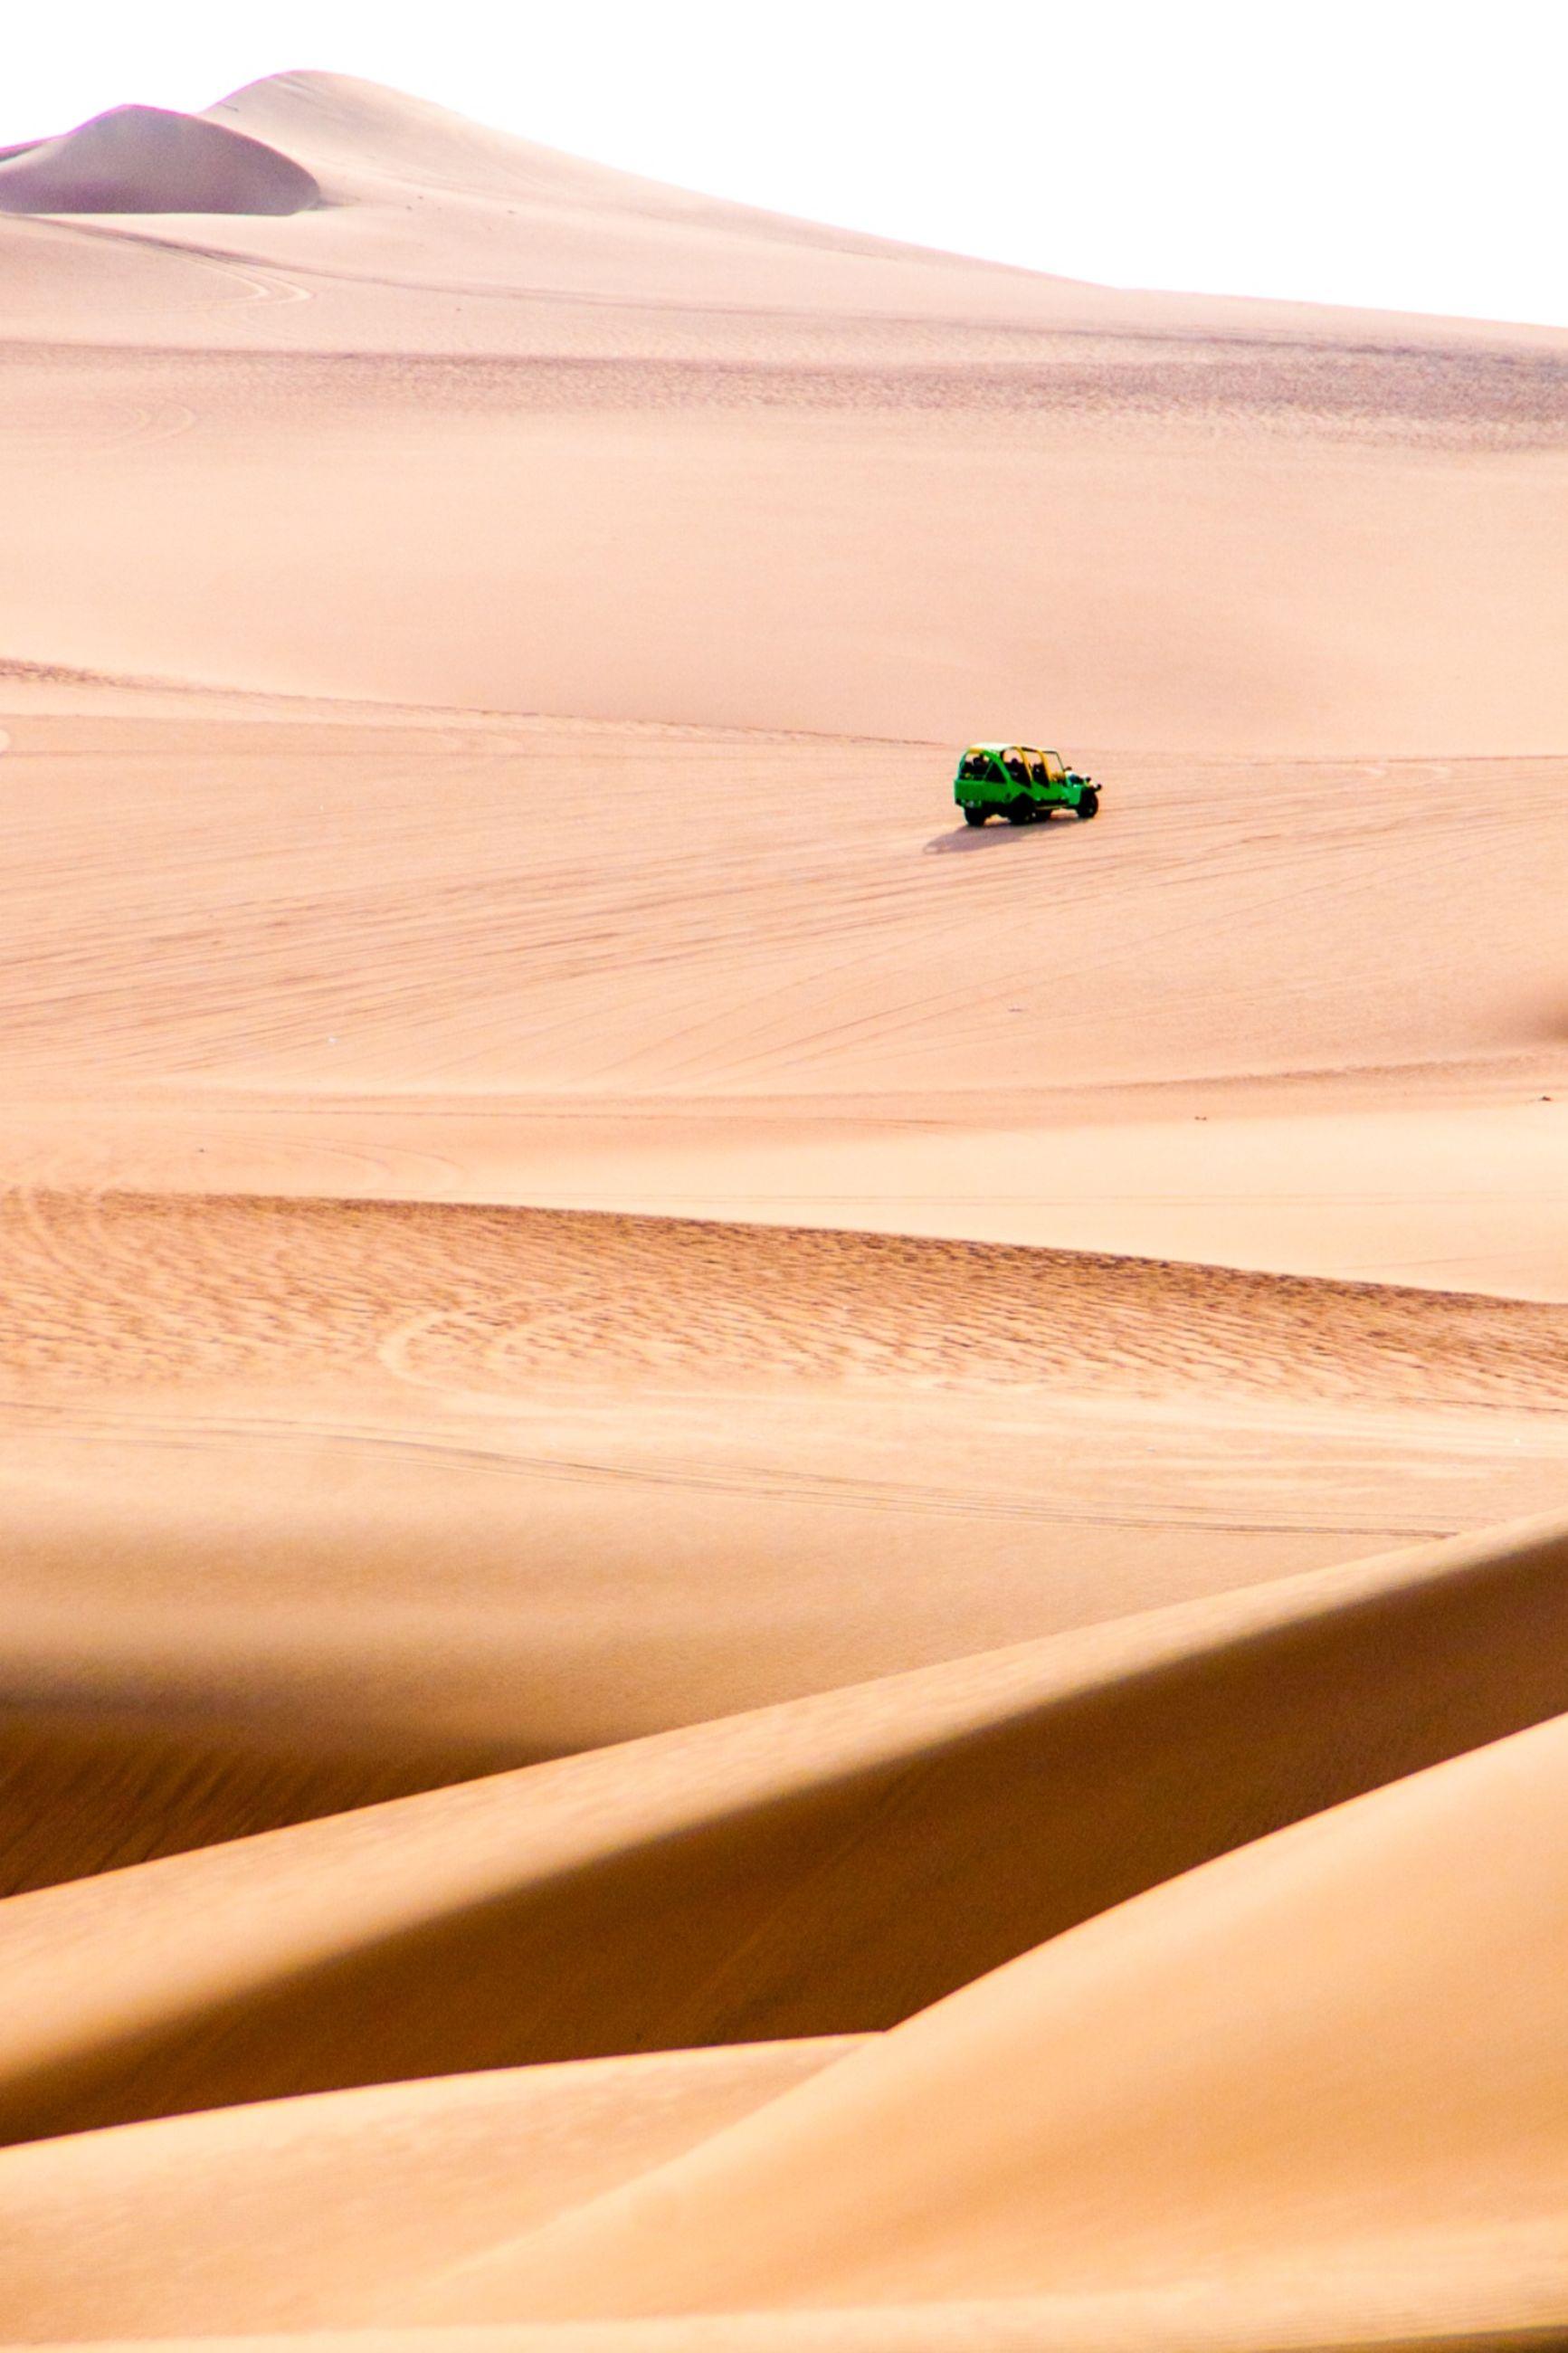 SCENIC VIEW OF DESERT LAND